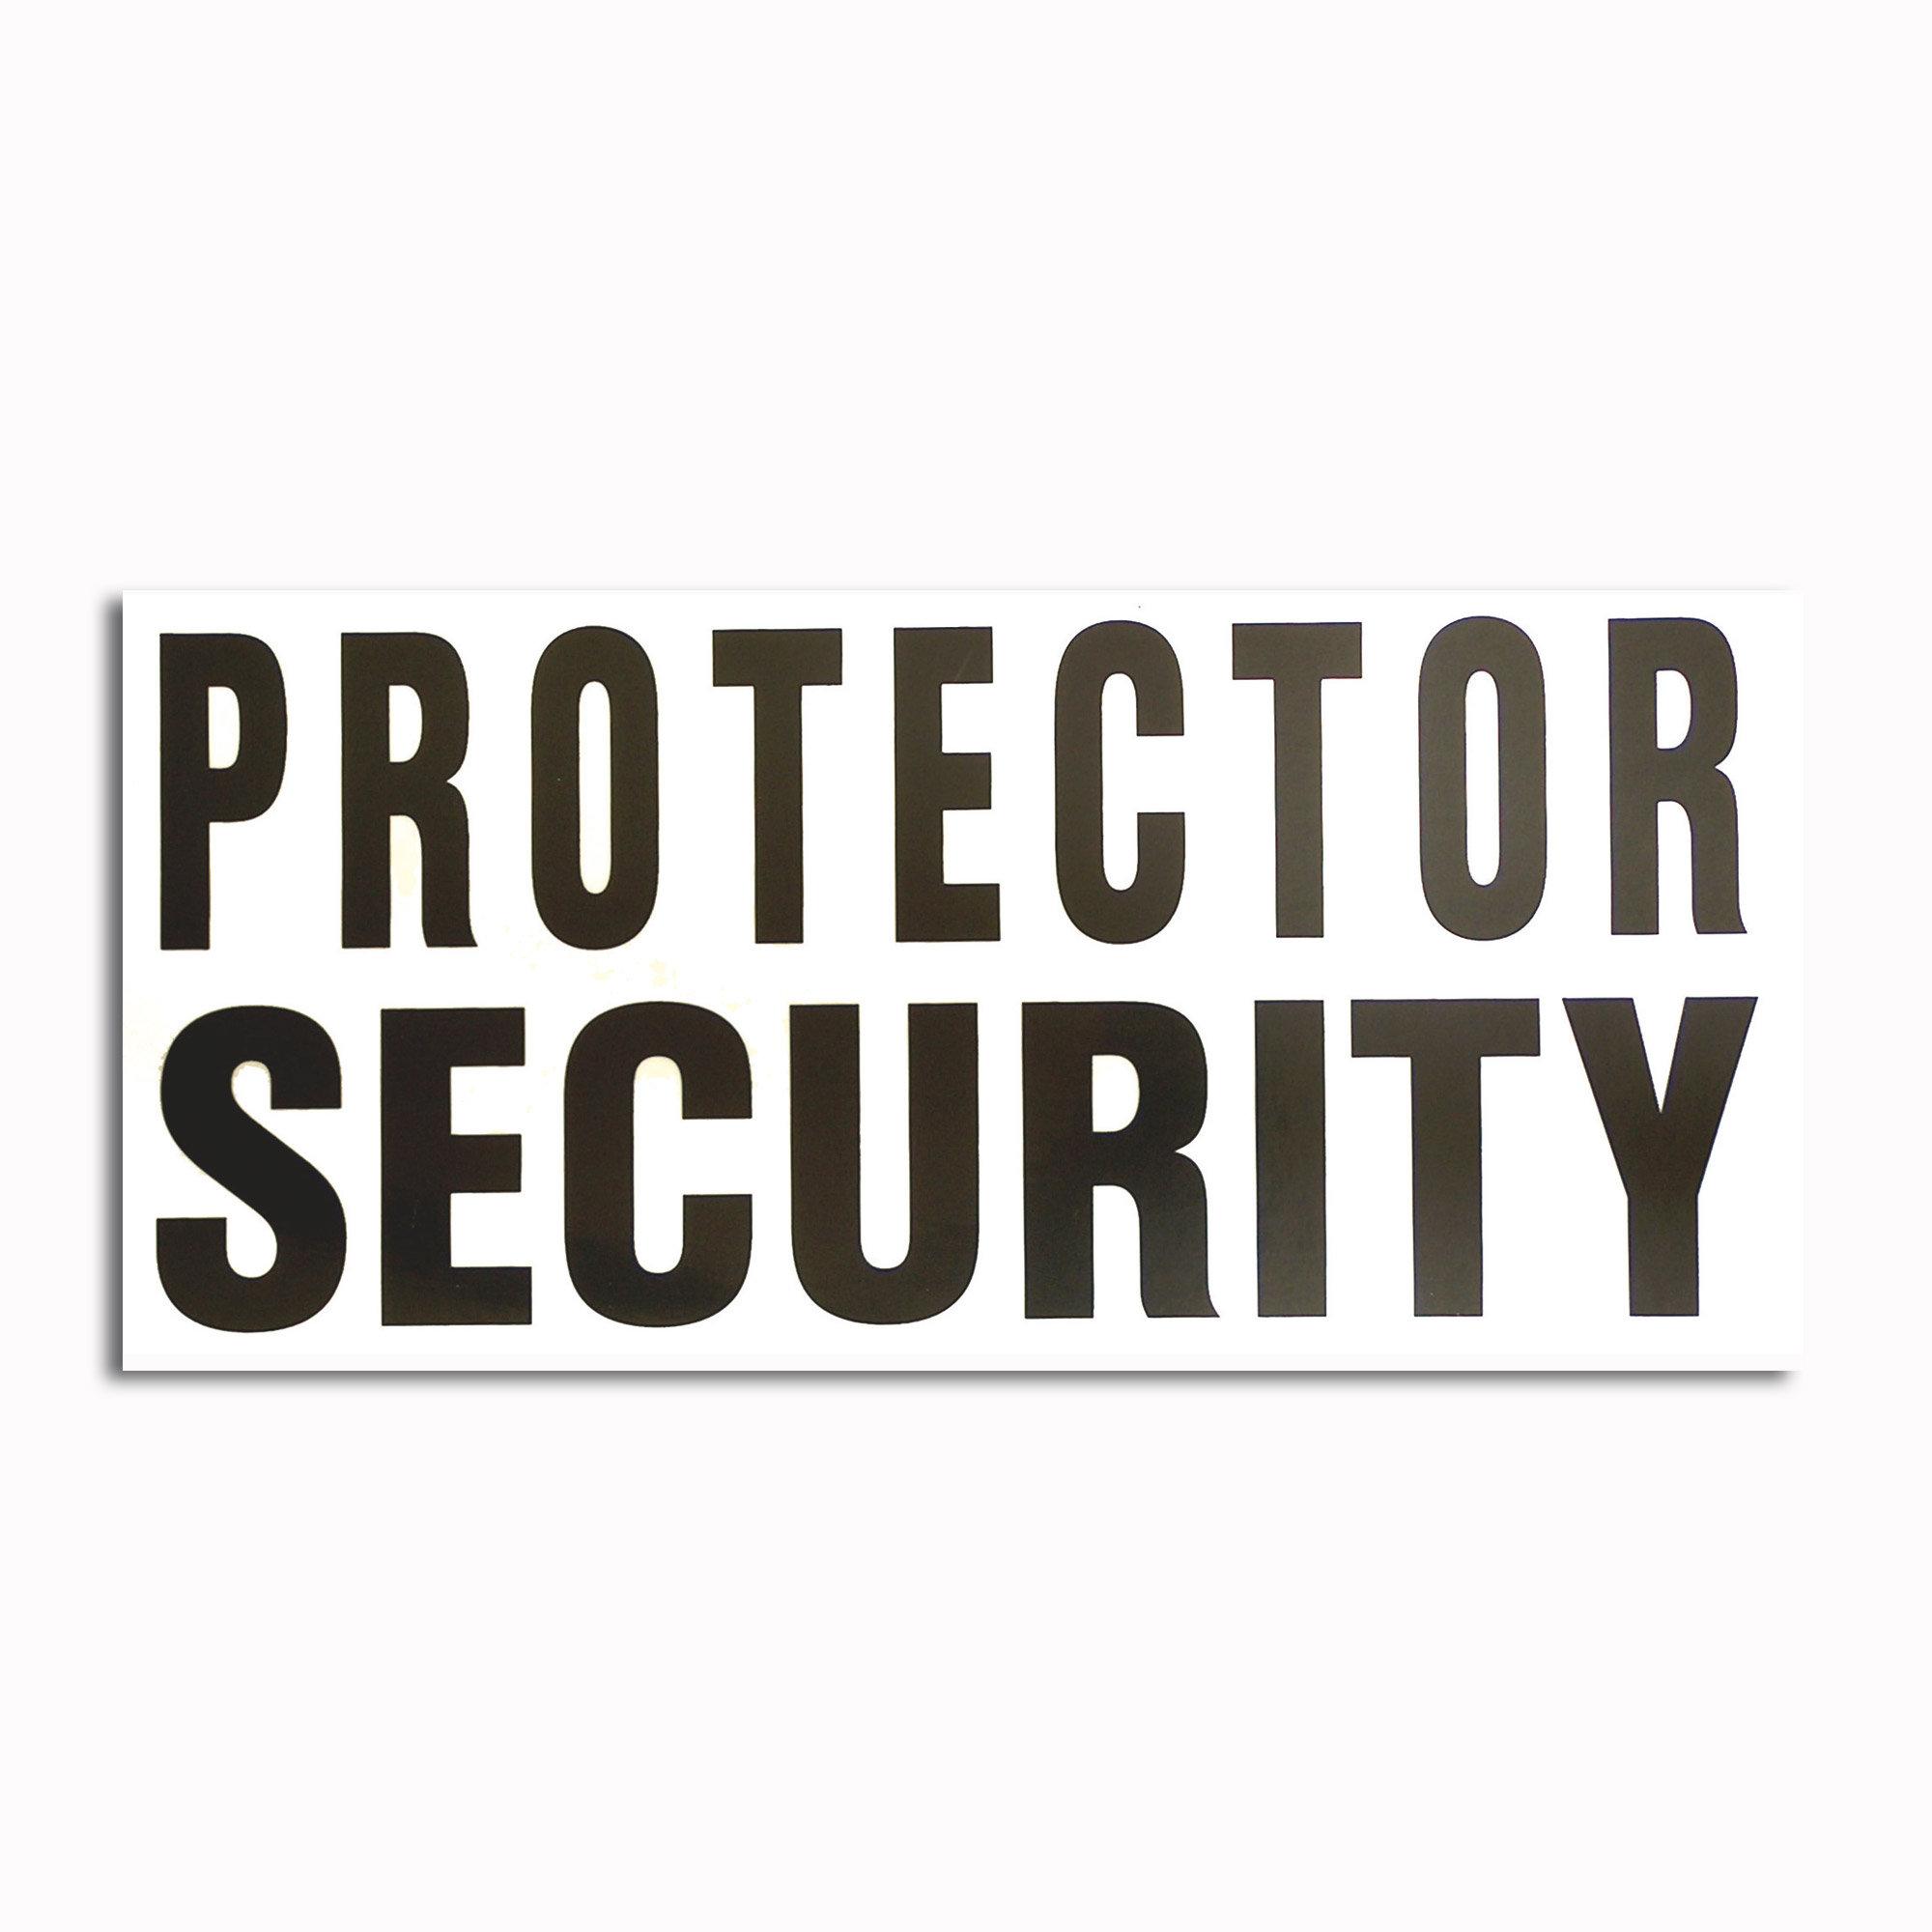 Autocollant transparent Protector Security